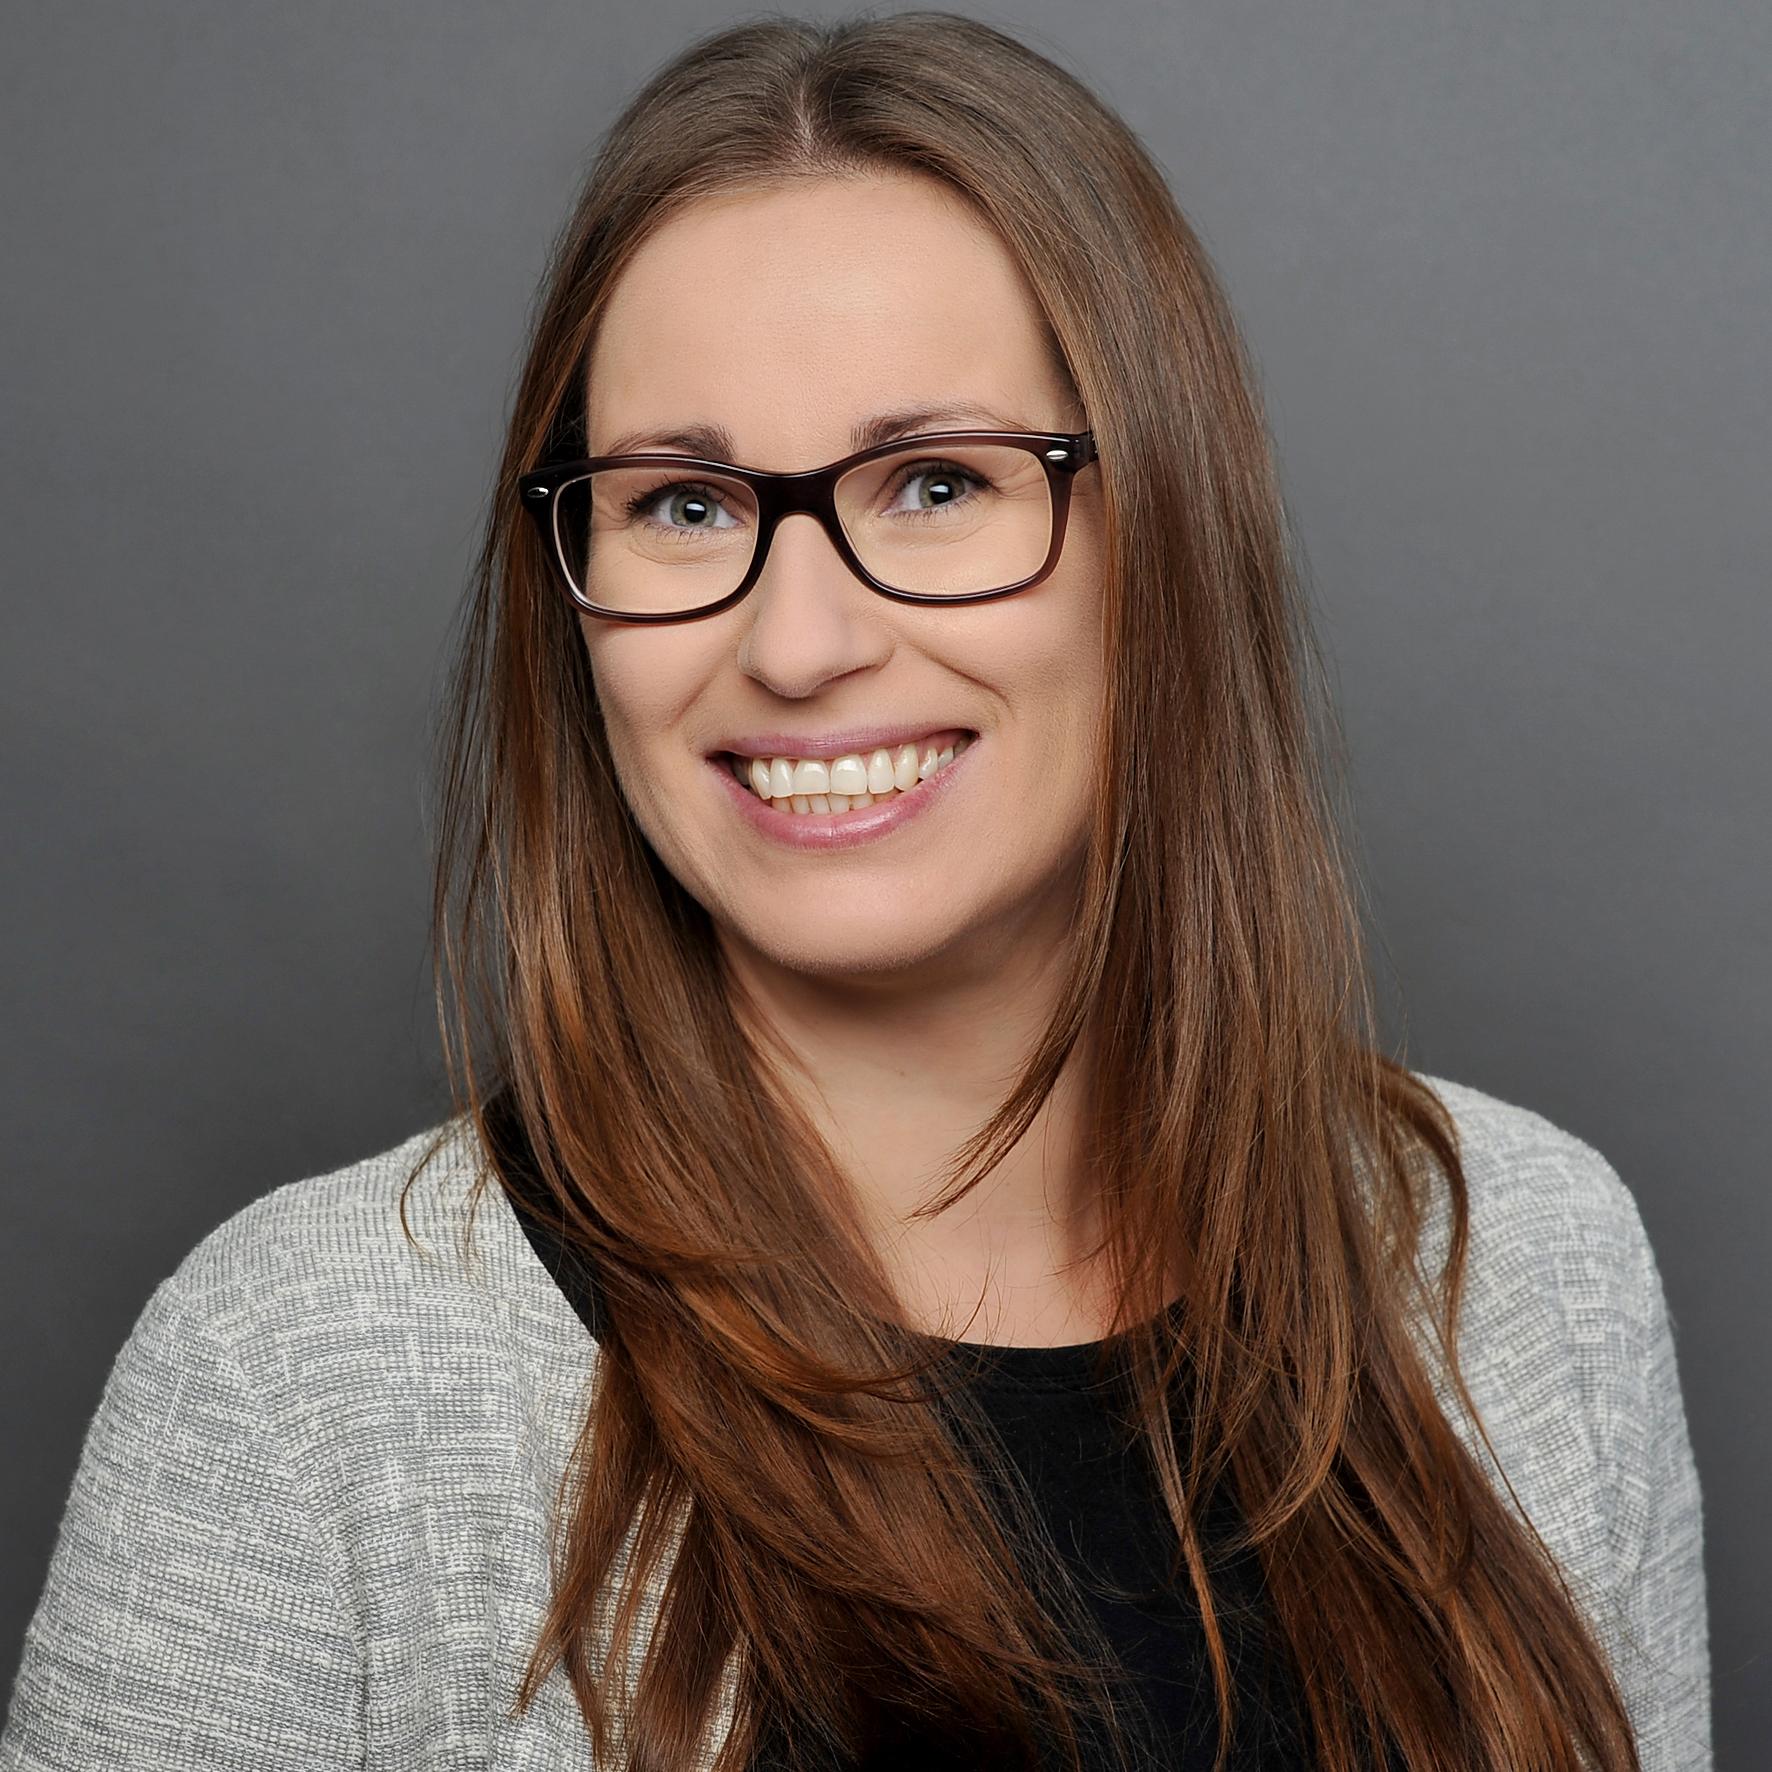 Anja Globke